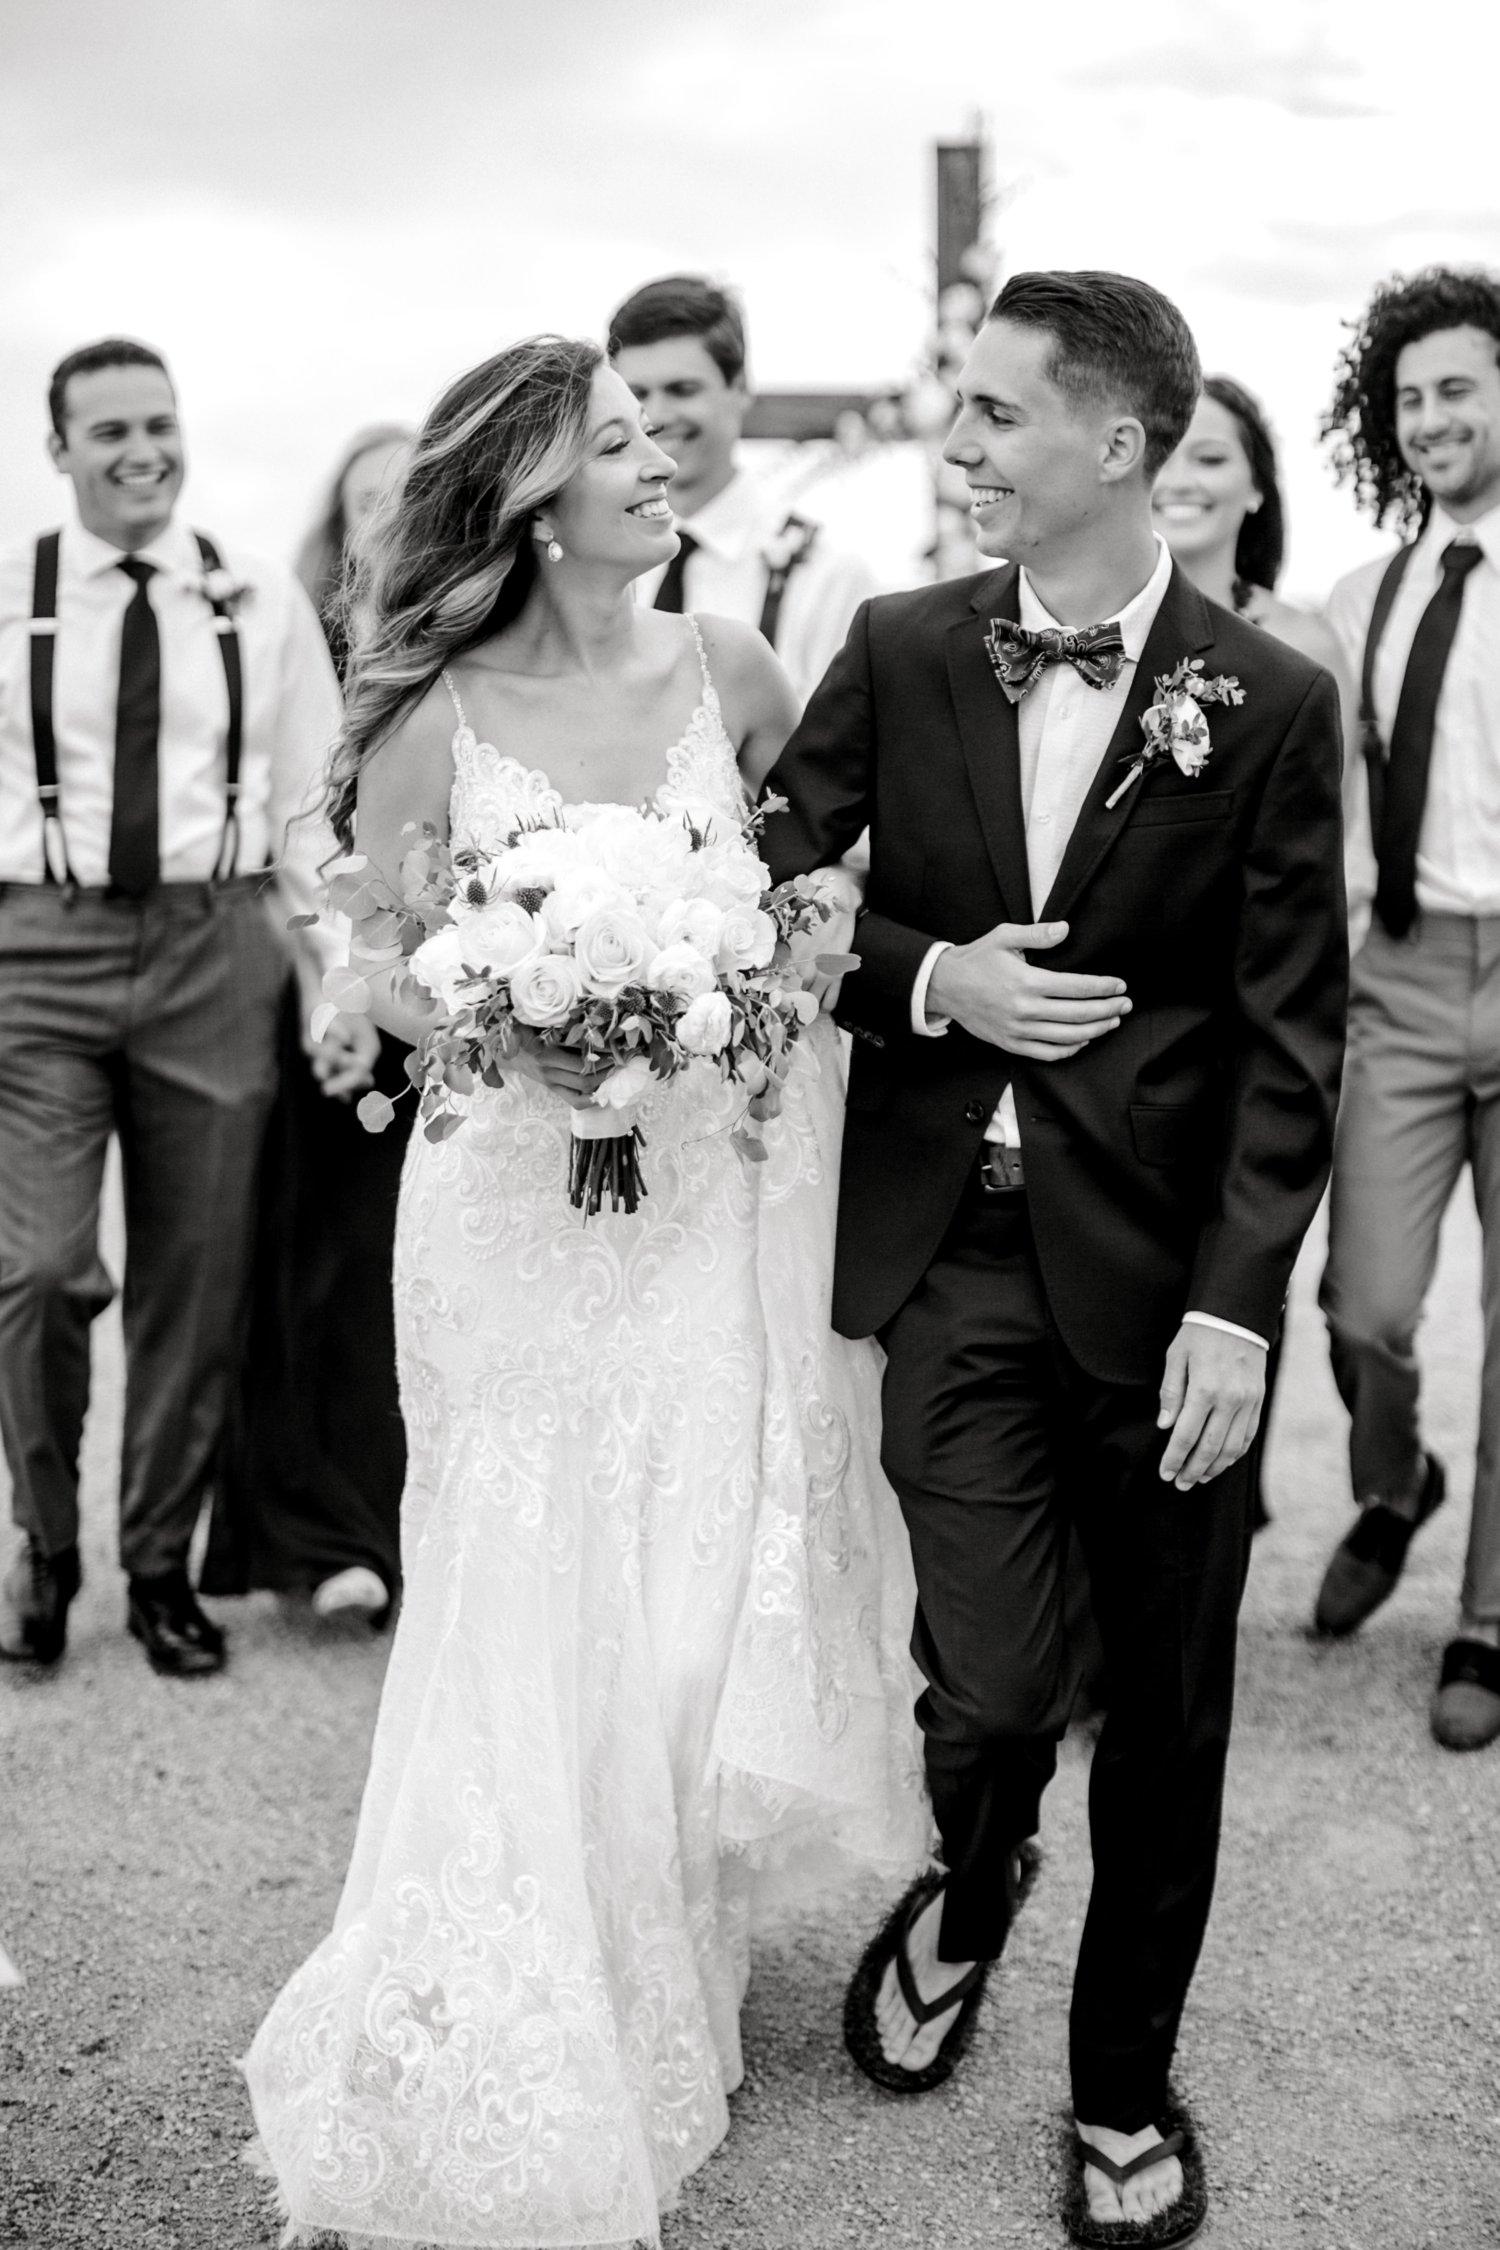 Ashley_John_English_Elegant_Texas_Wedding_Outdoors_Ranch_Caprock_Winery_ALLEEJ_0058.jpg